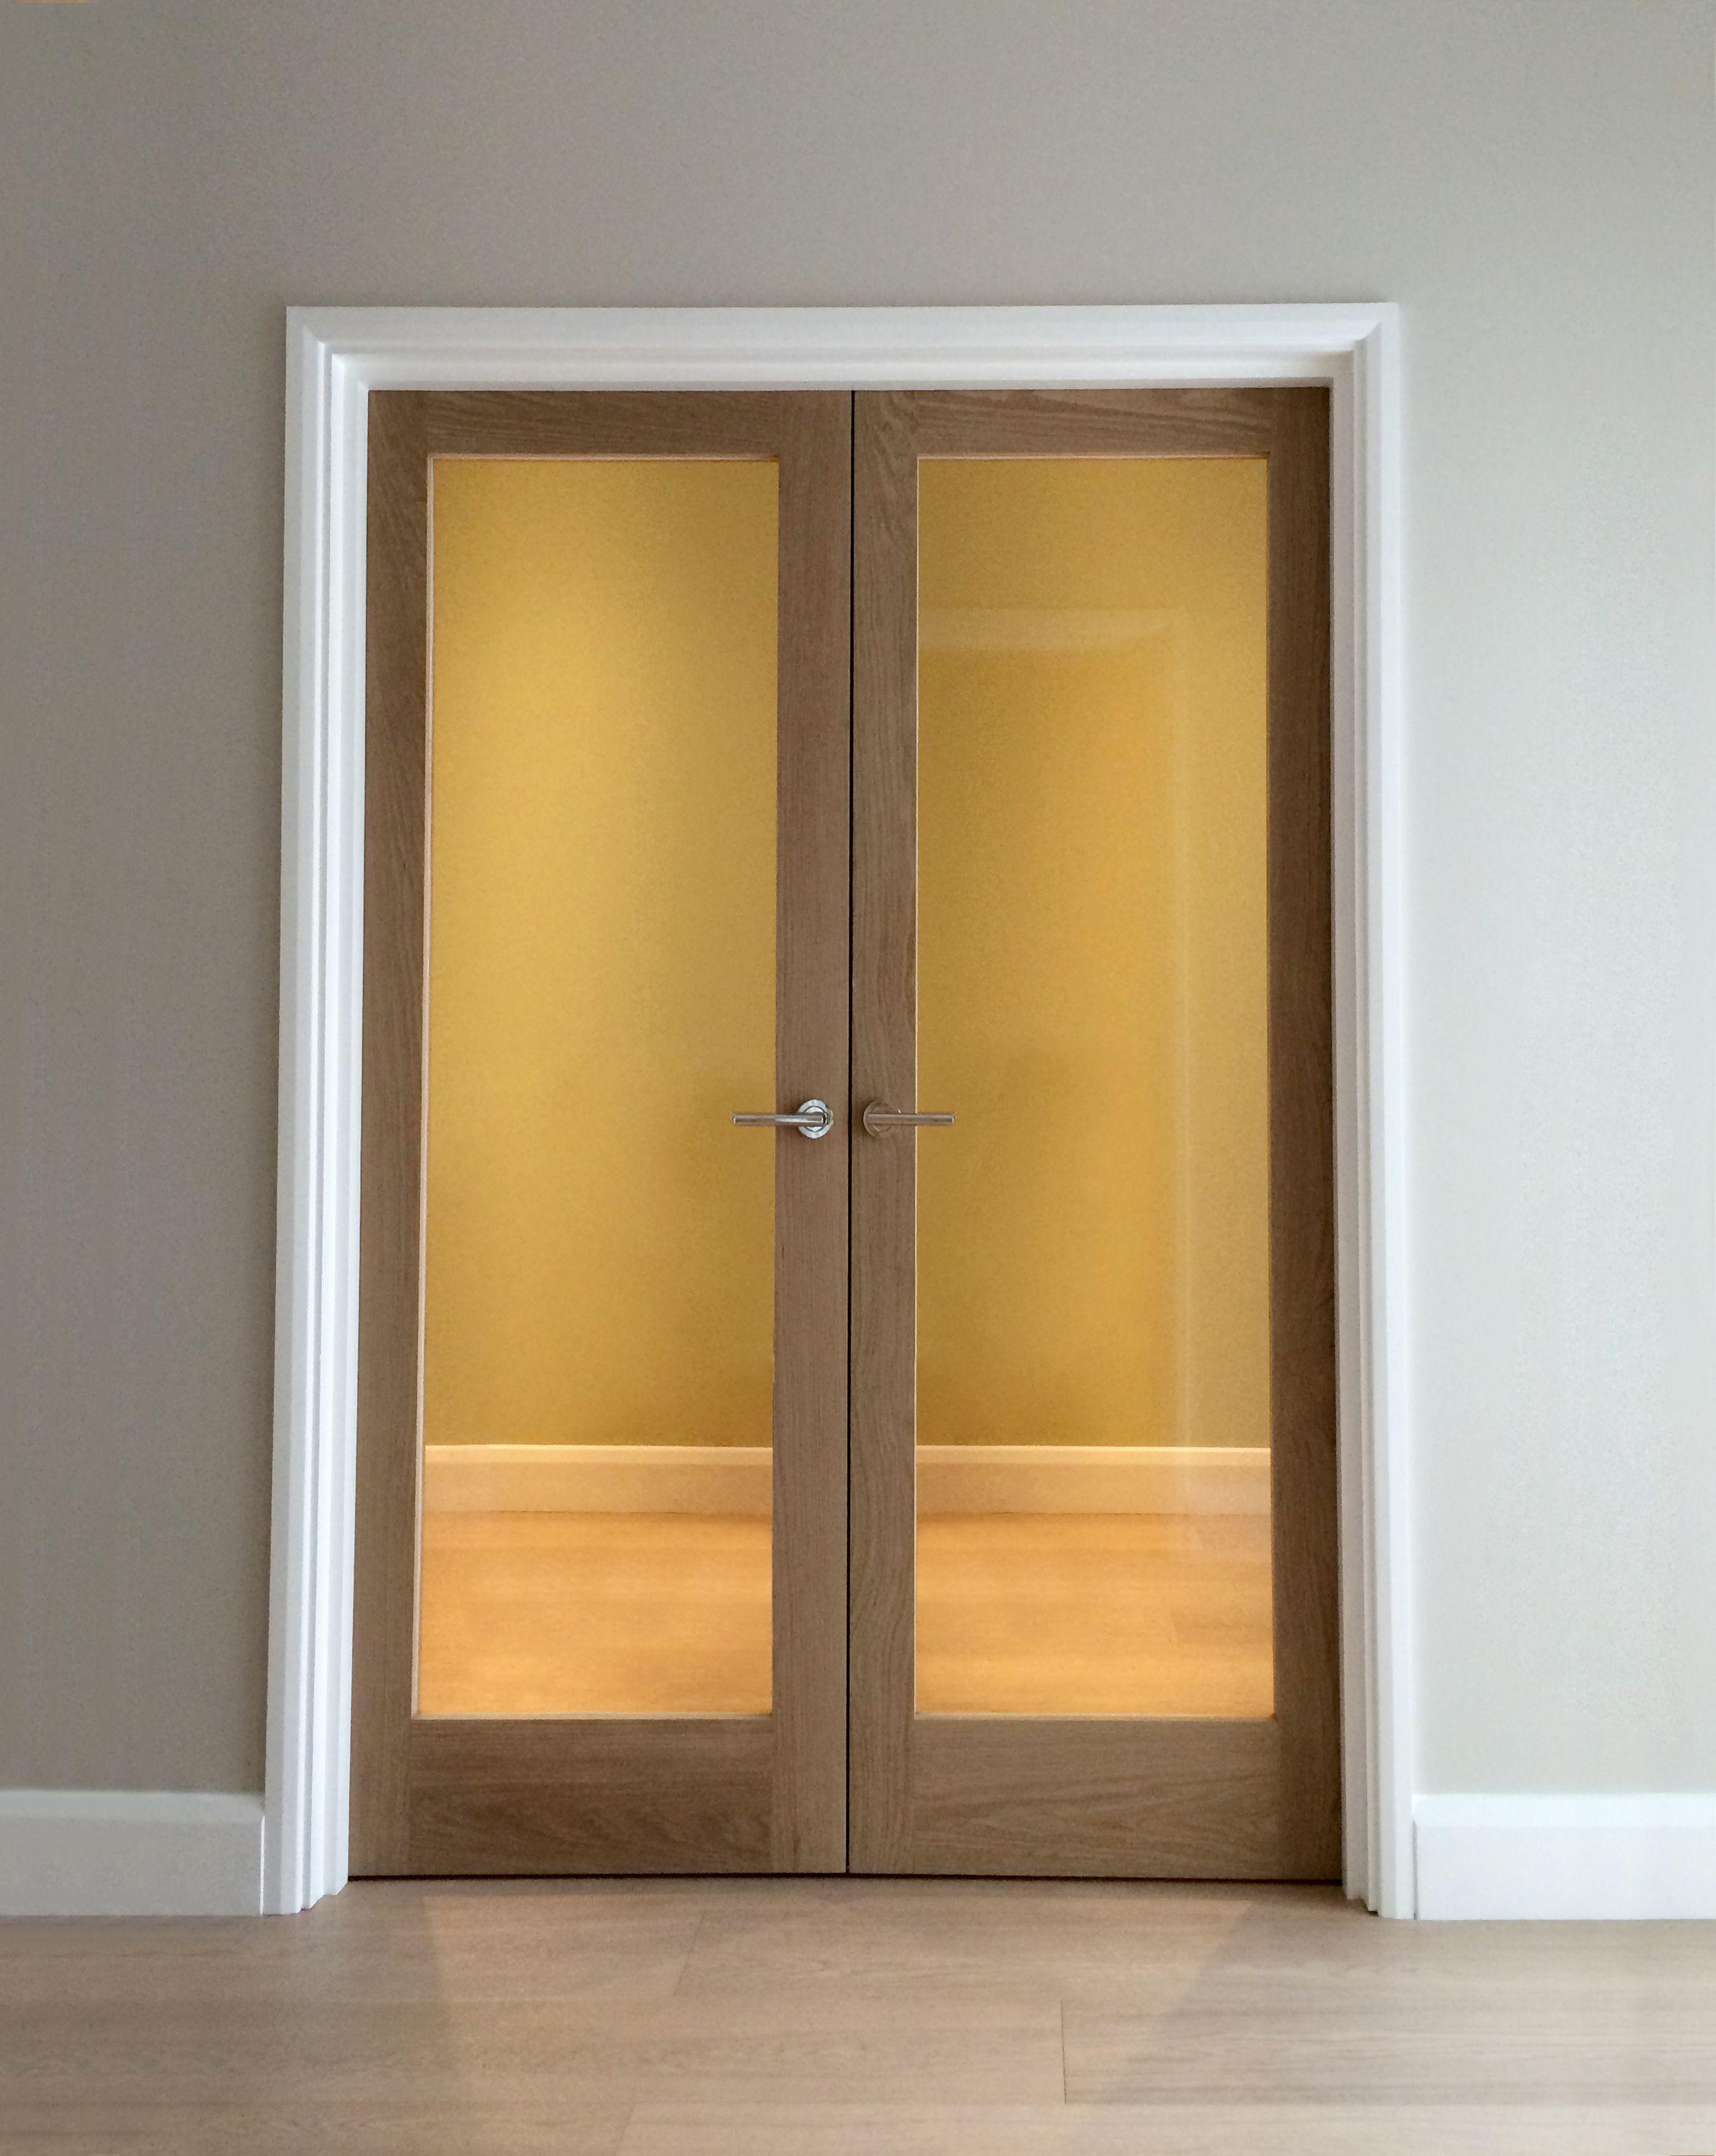 Internal Glazed Double Doors Internal Glazed Double Doors Internal Double Doors Internal Doors